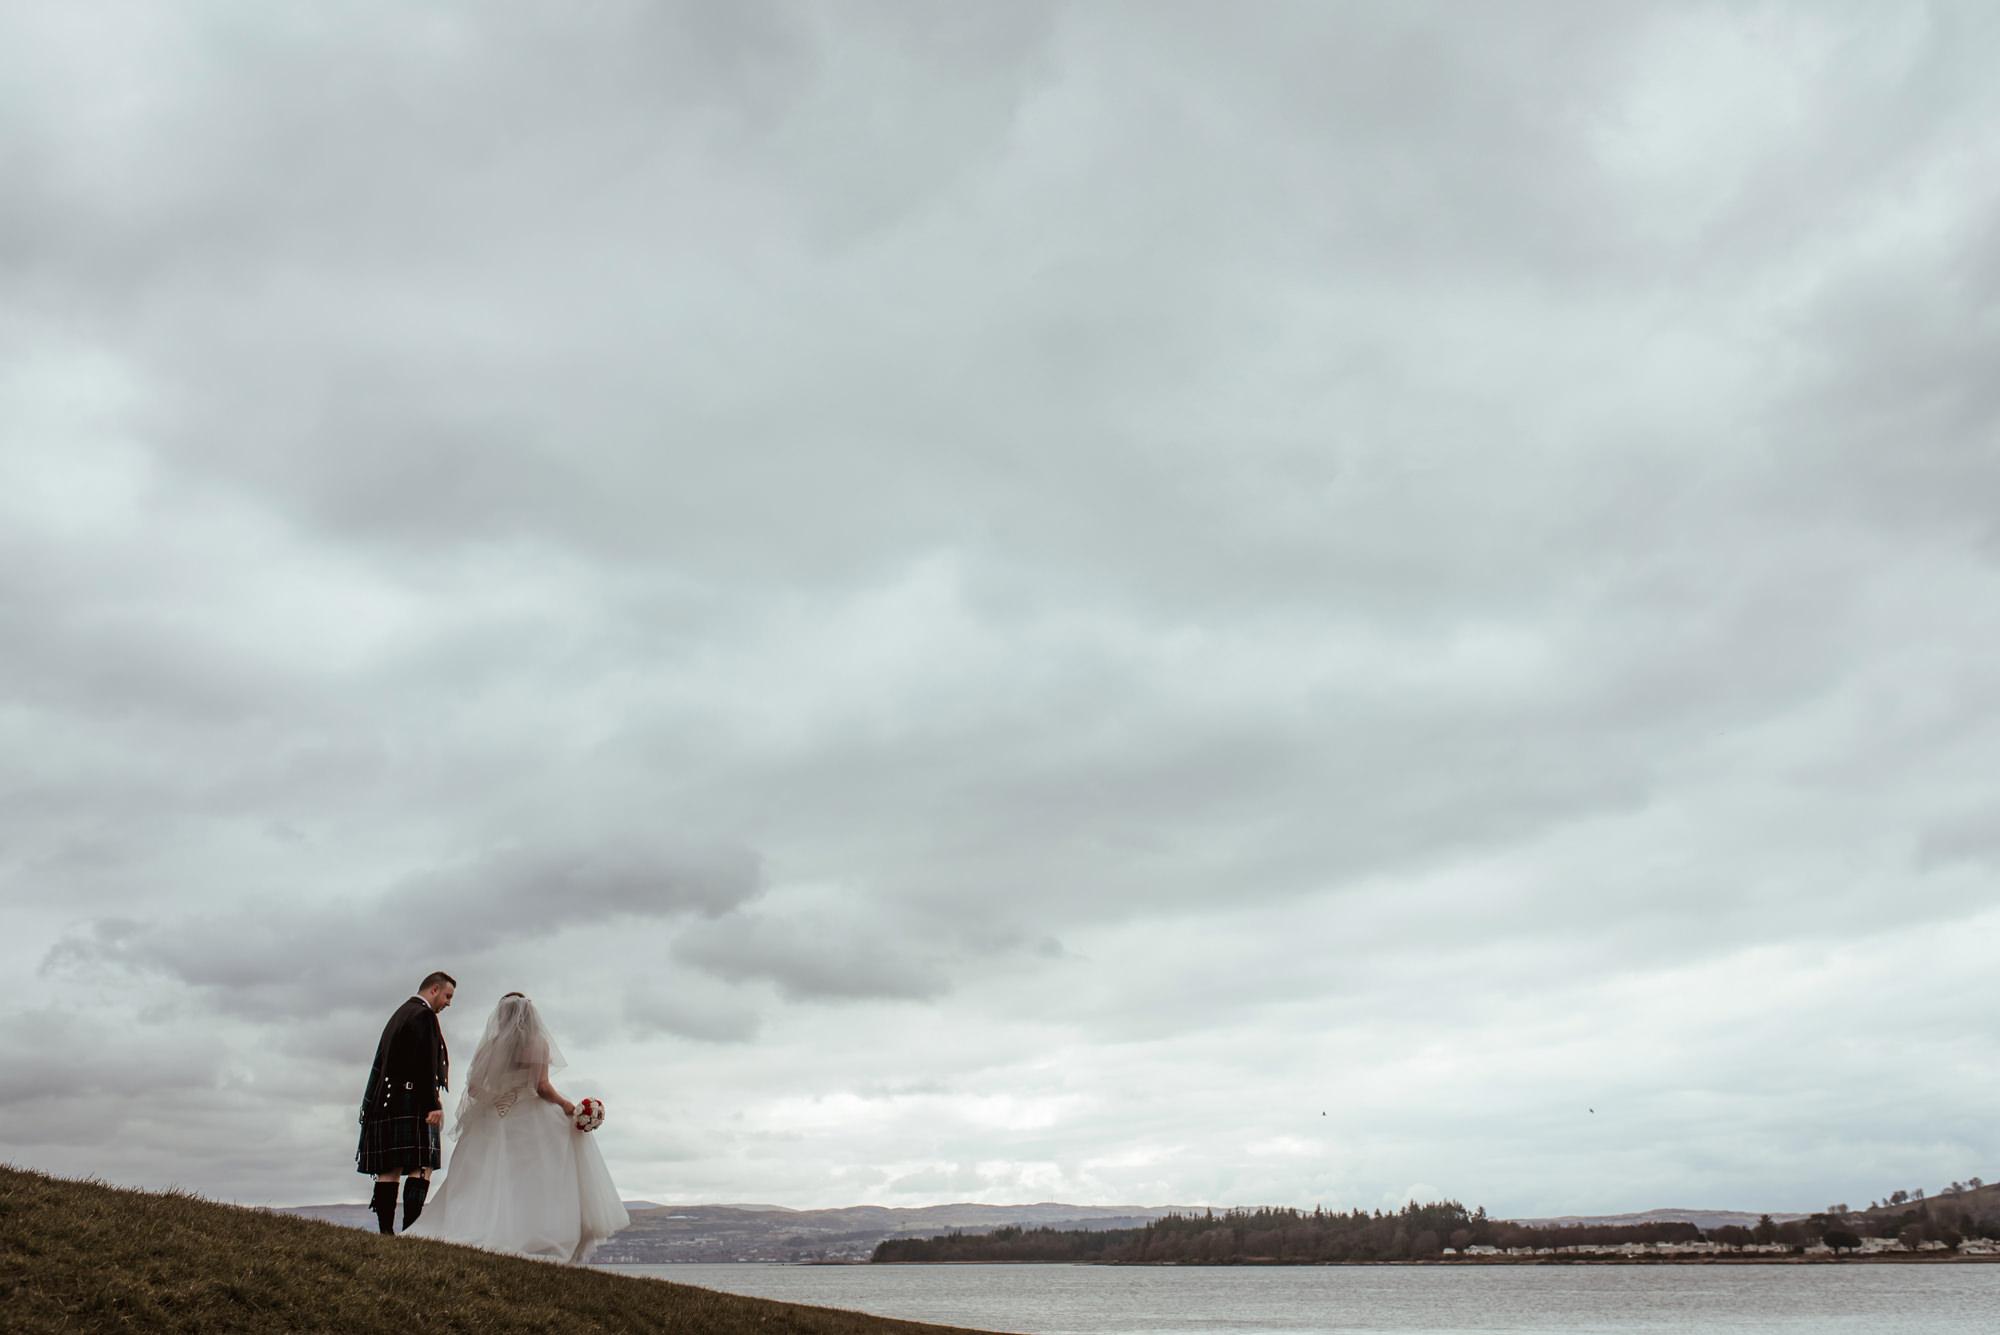 rosslea-hall-wedding-photographer (5).jpg